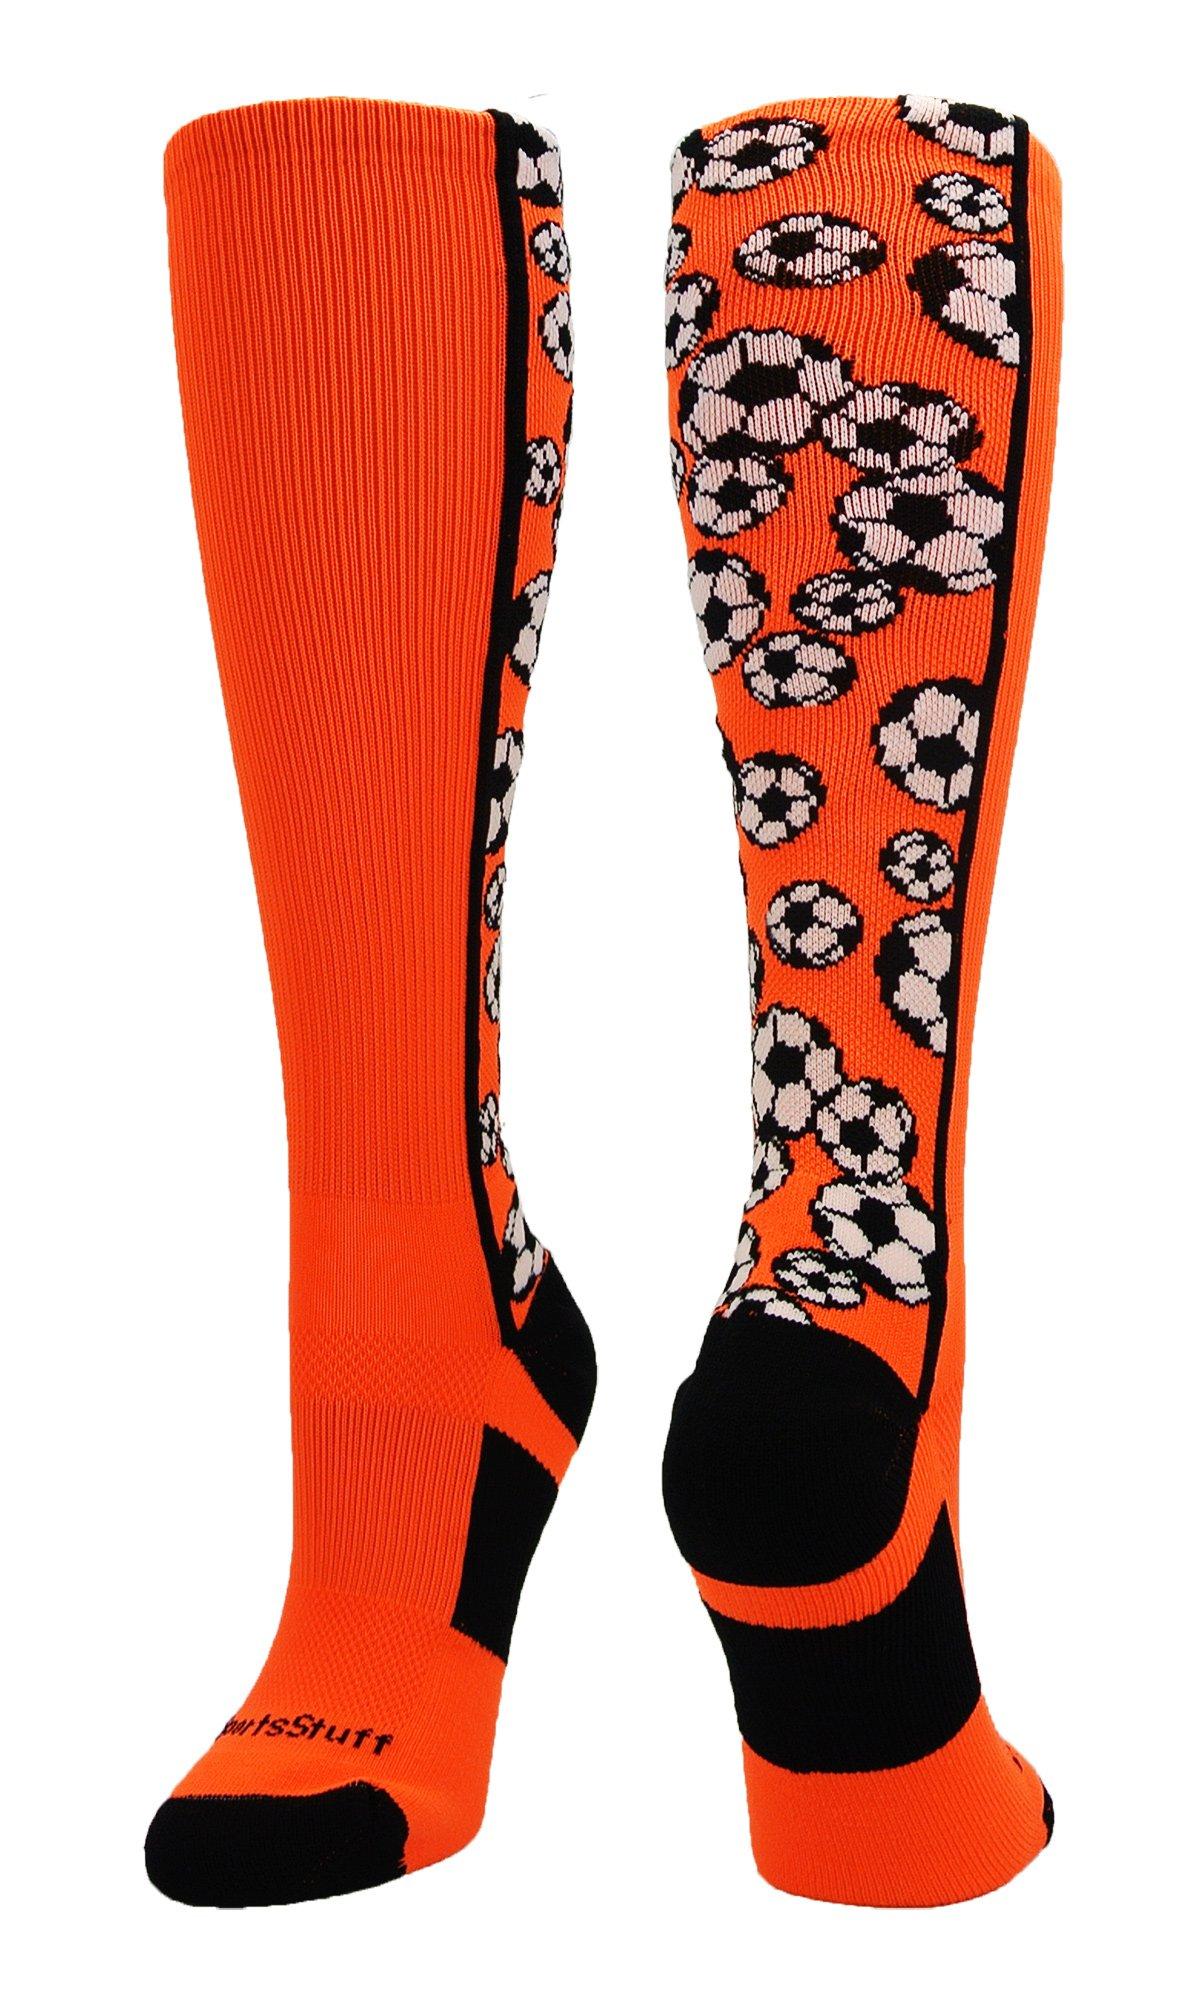 MadSportsStuff Crazy Soccer Socks with Soccer Balls Over The Calf (Neon Orange/Black, Medium) by MadSportsStuff